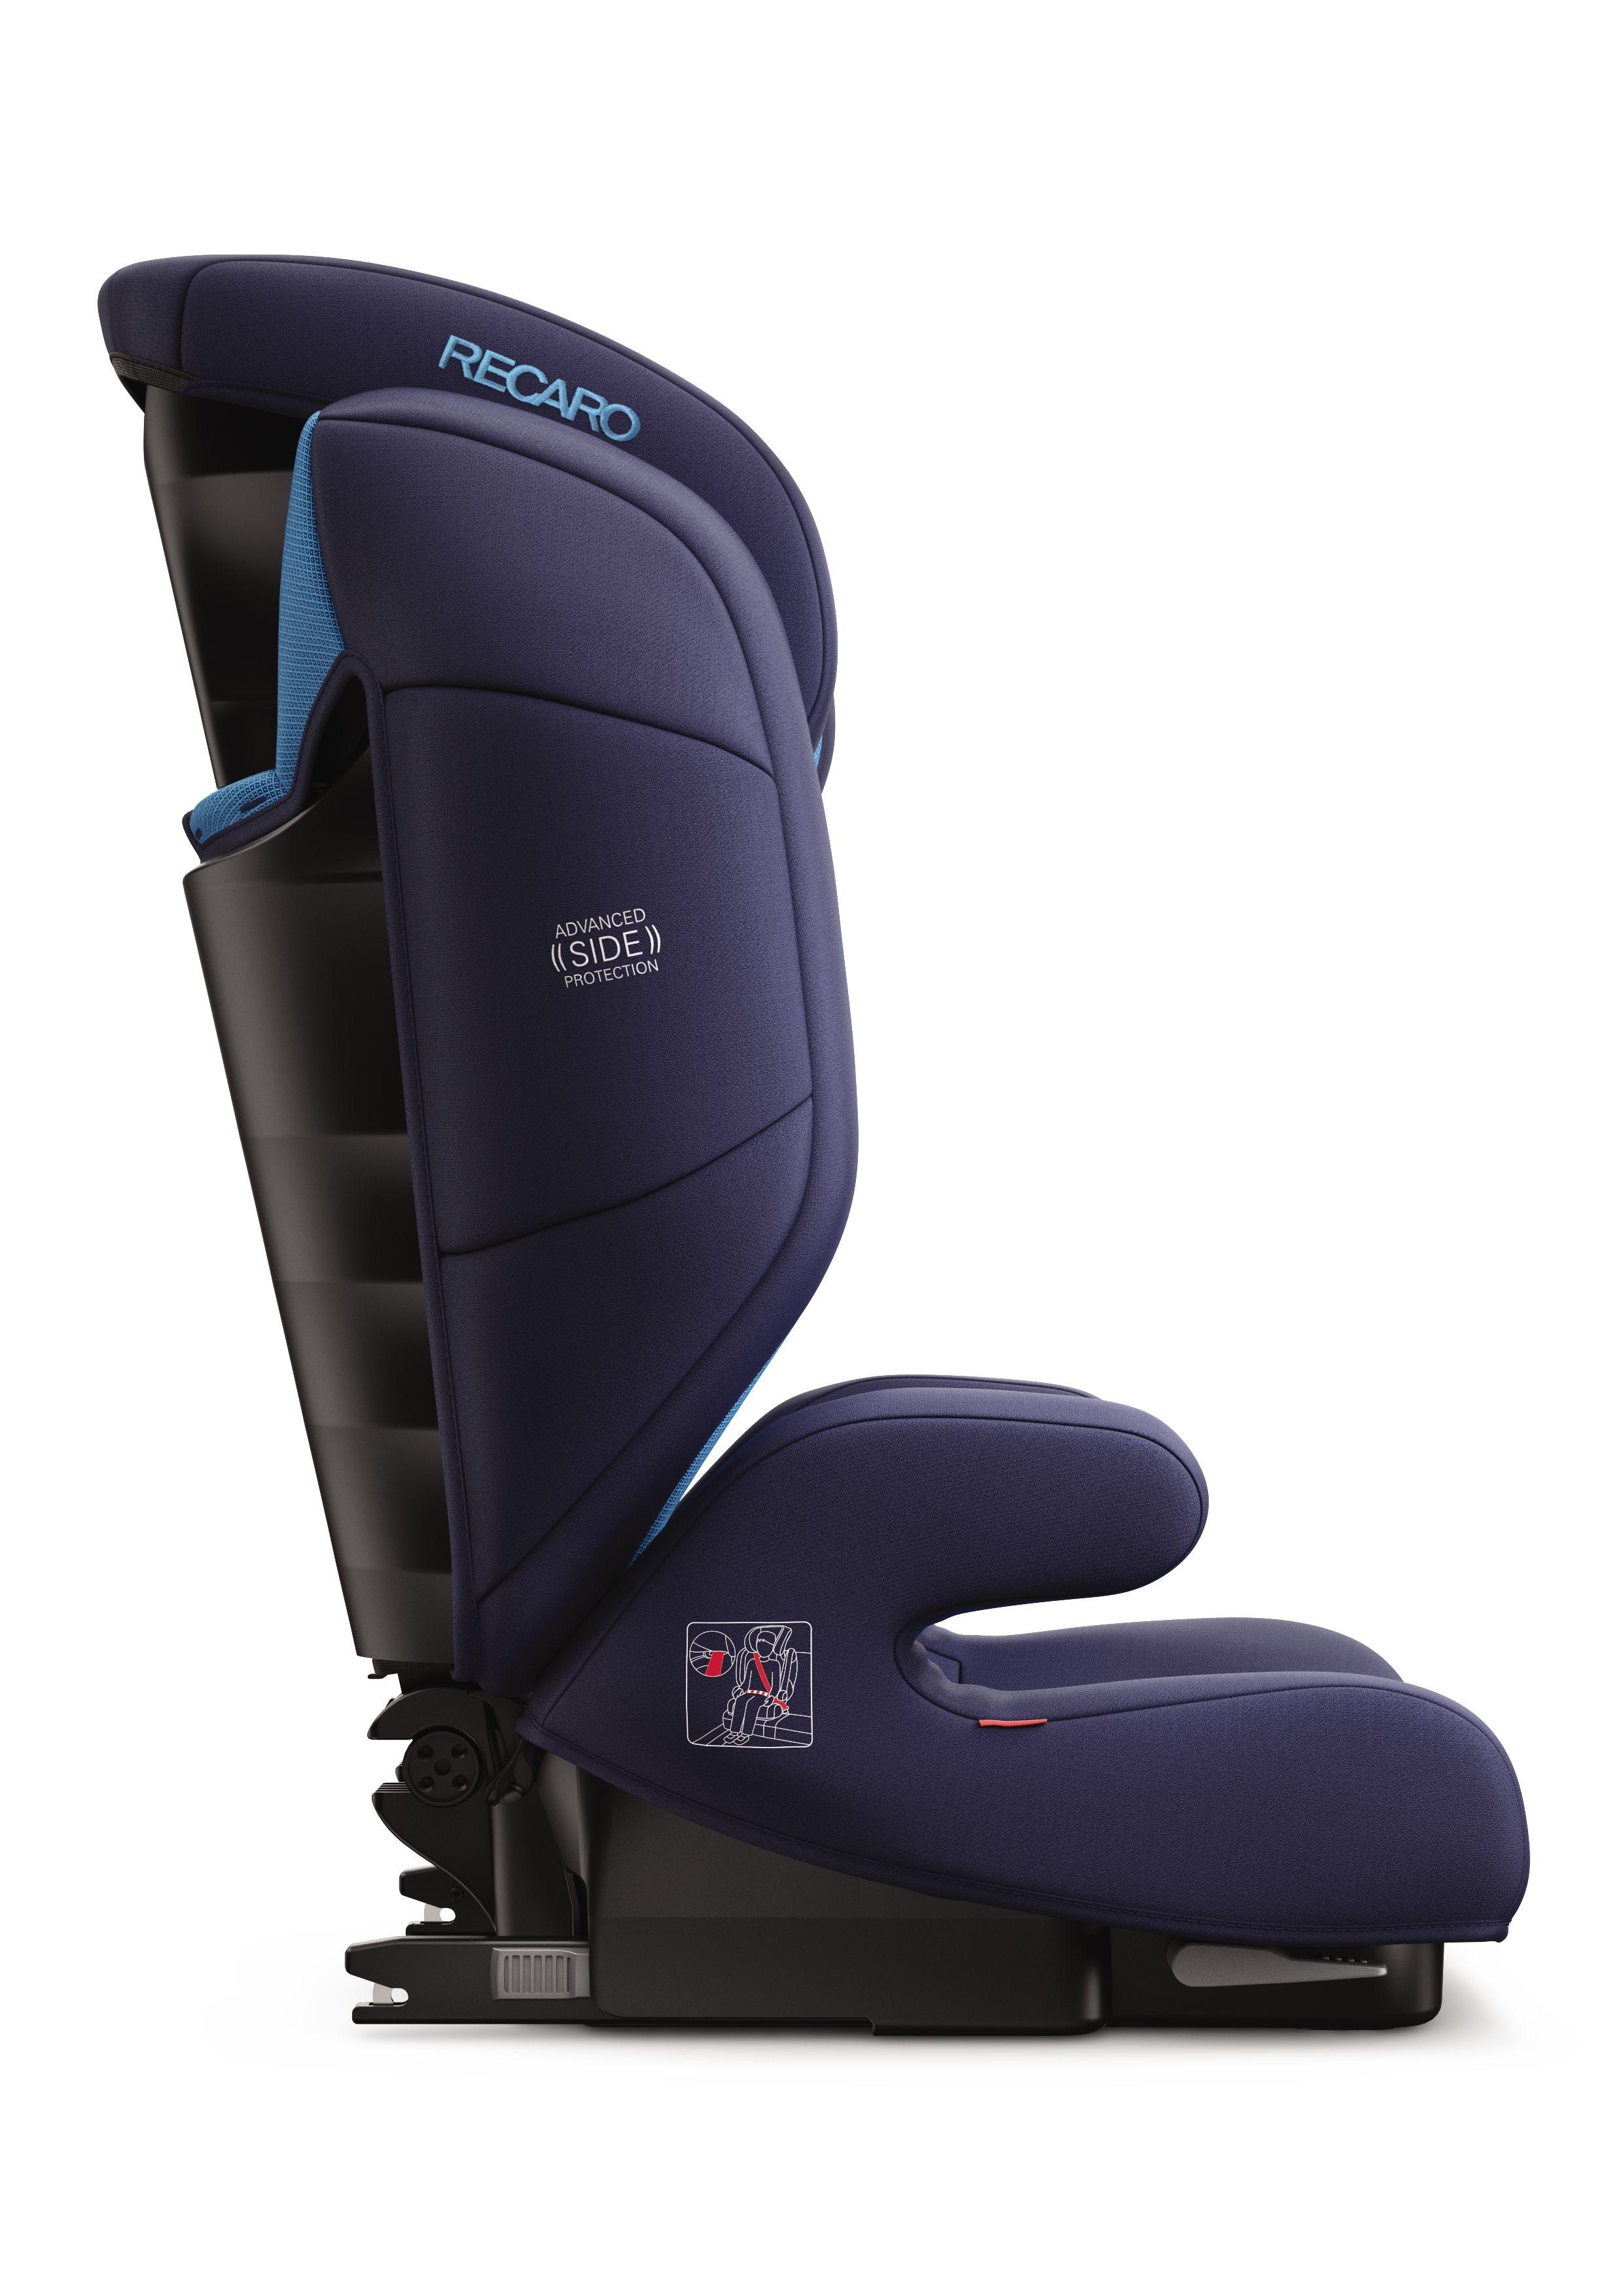 recaro child car seat monza nova evo seatfix 2018 performance black buy at kidsroom car seats. Black Bedroom Furniture Sets. Home Design Ideas